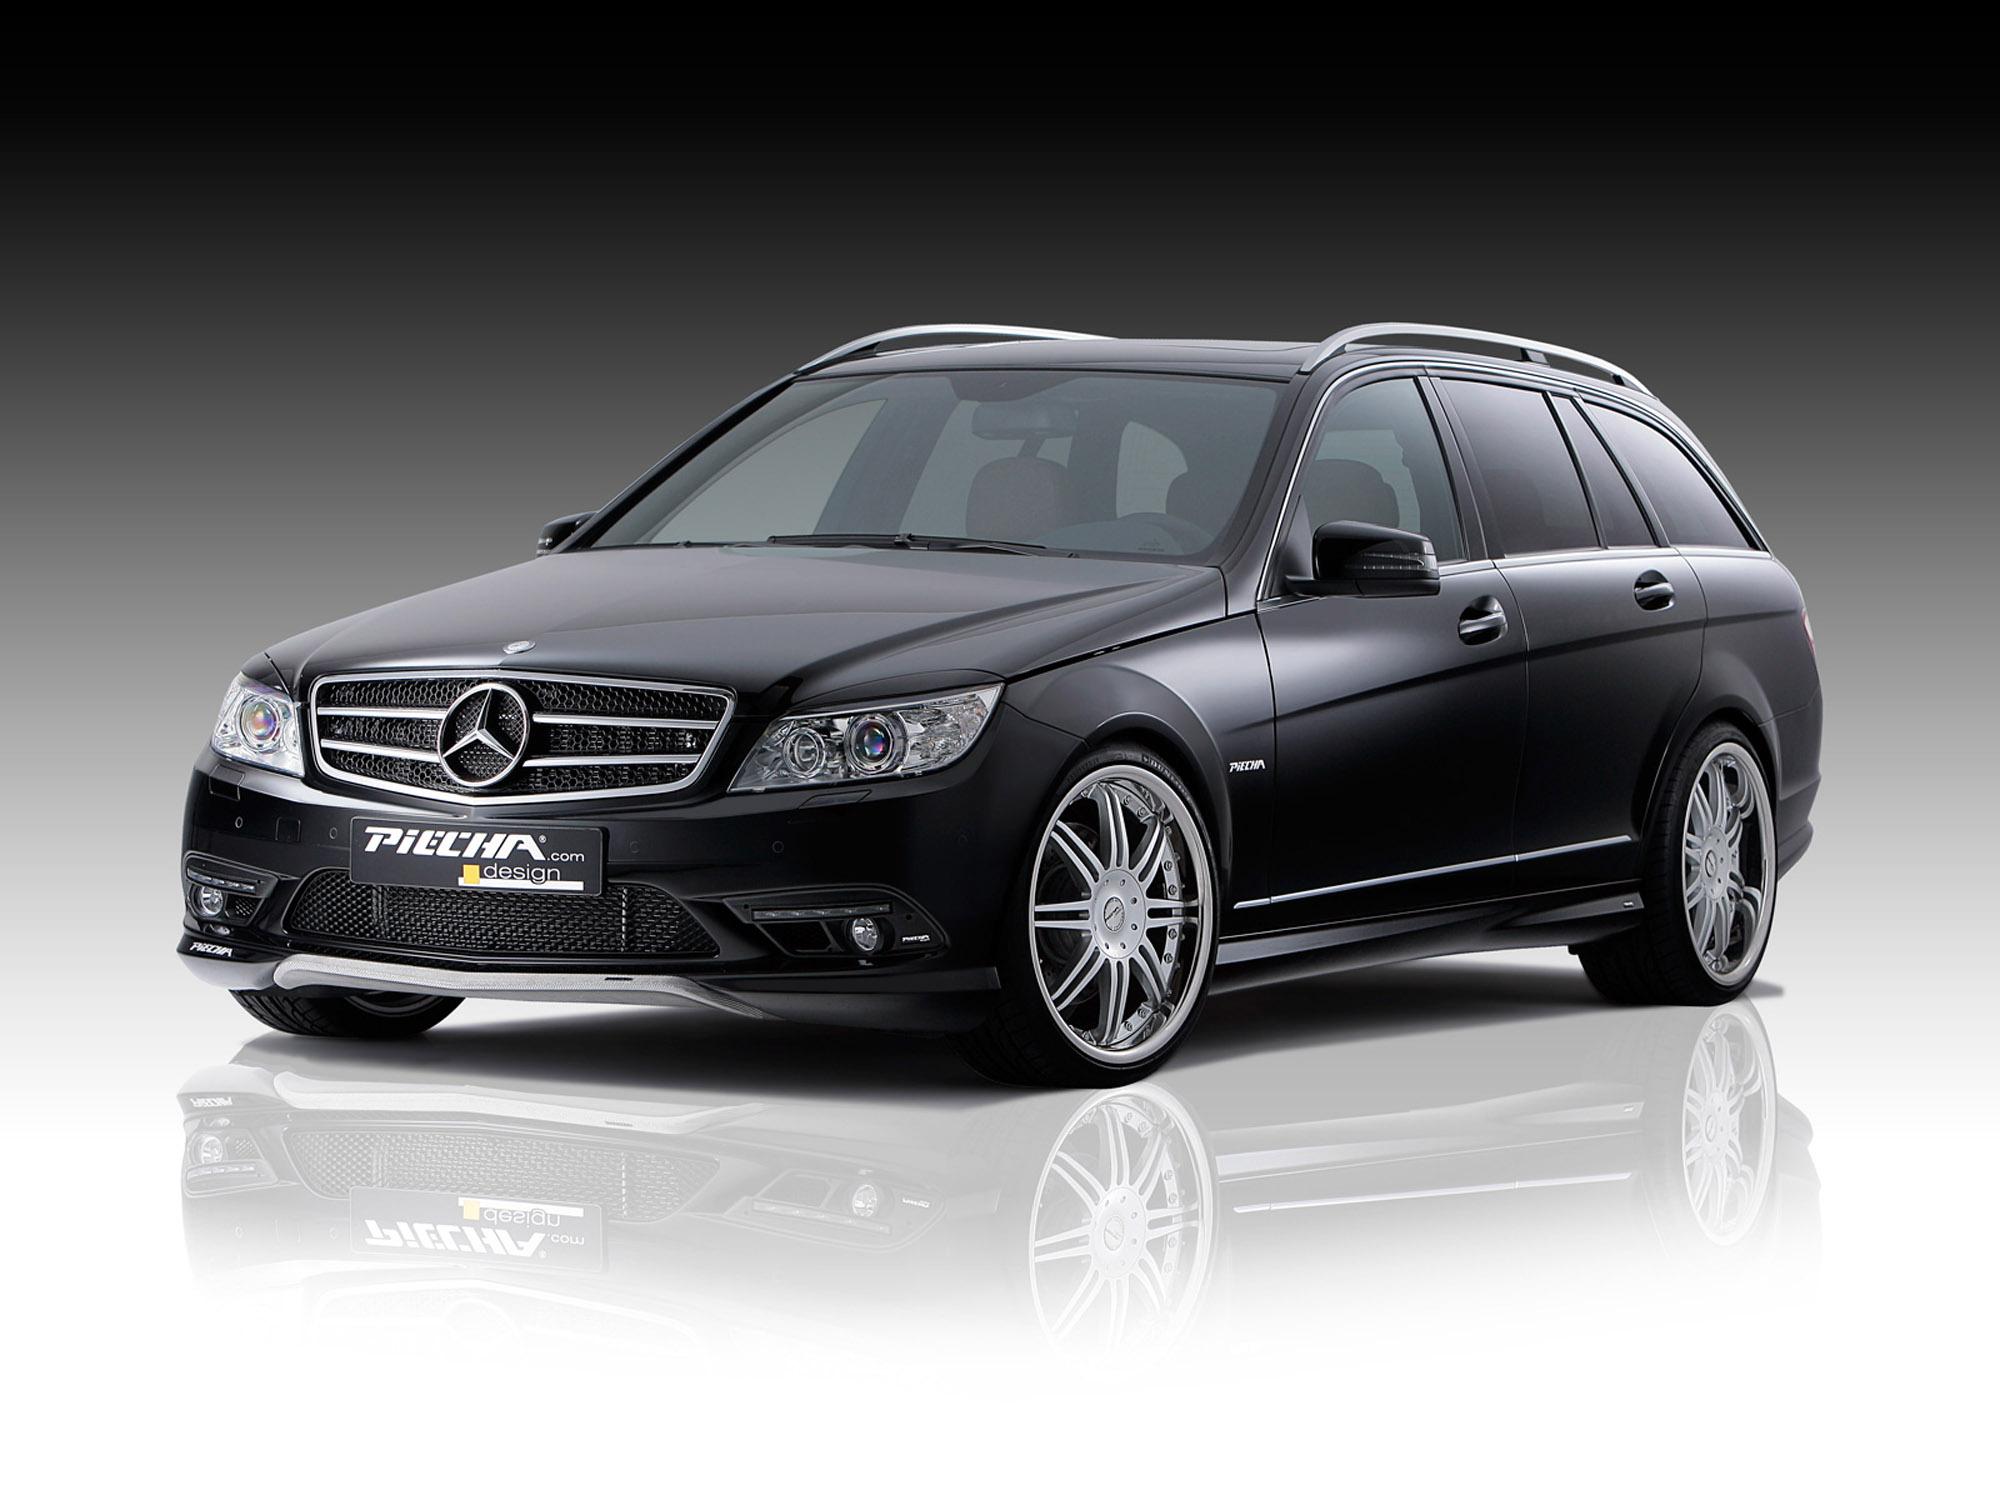 Piecha Design Mercedes Benz C Class Estate Picture 28616